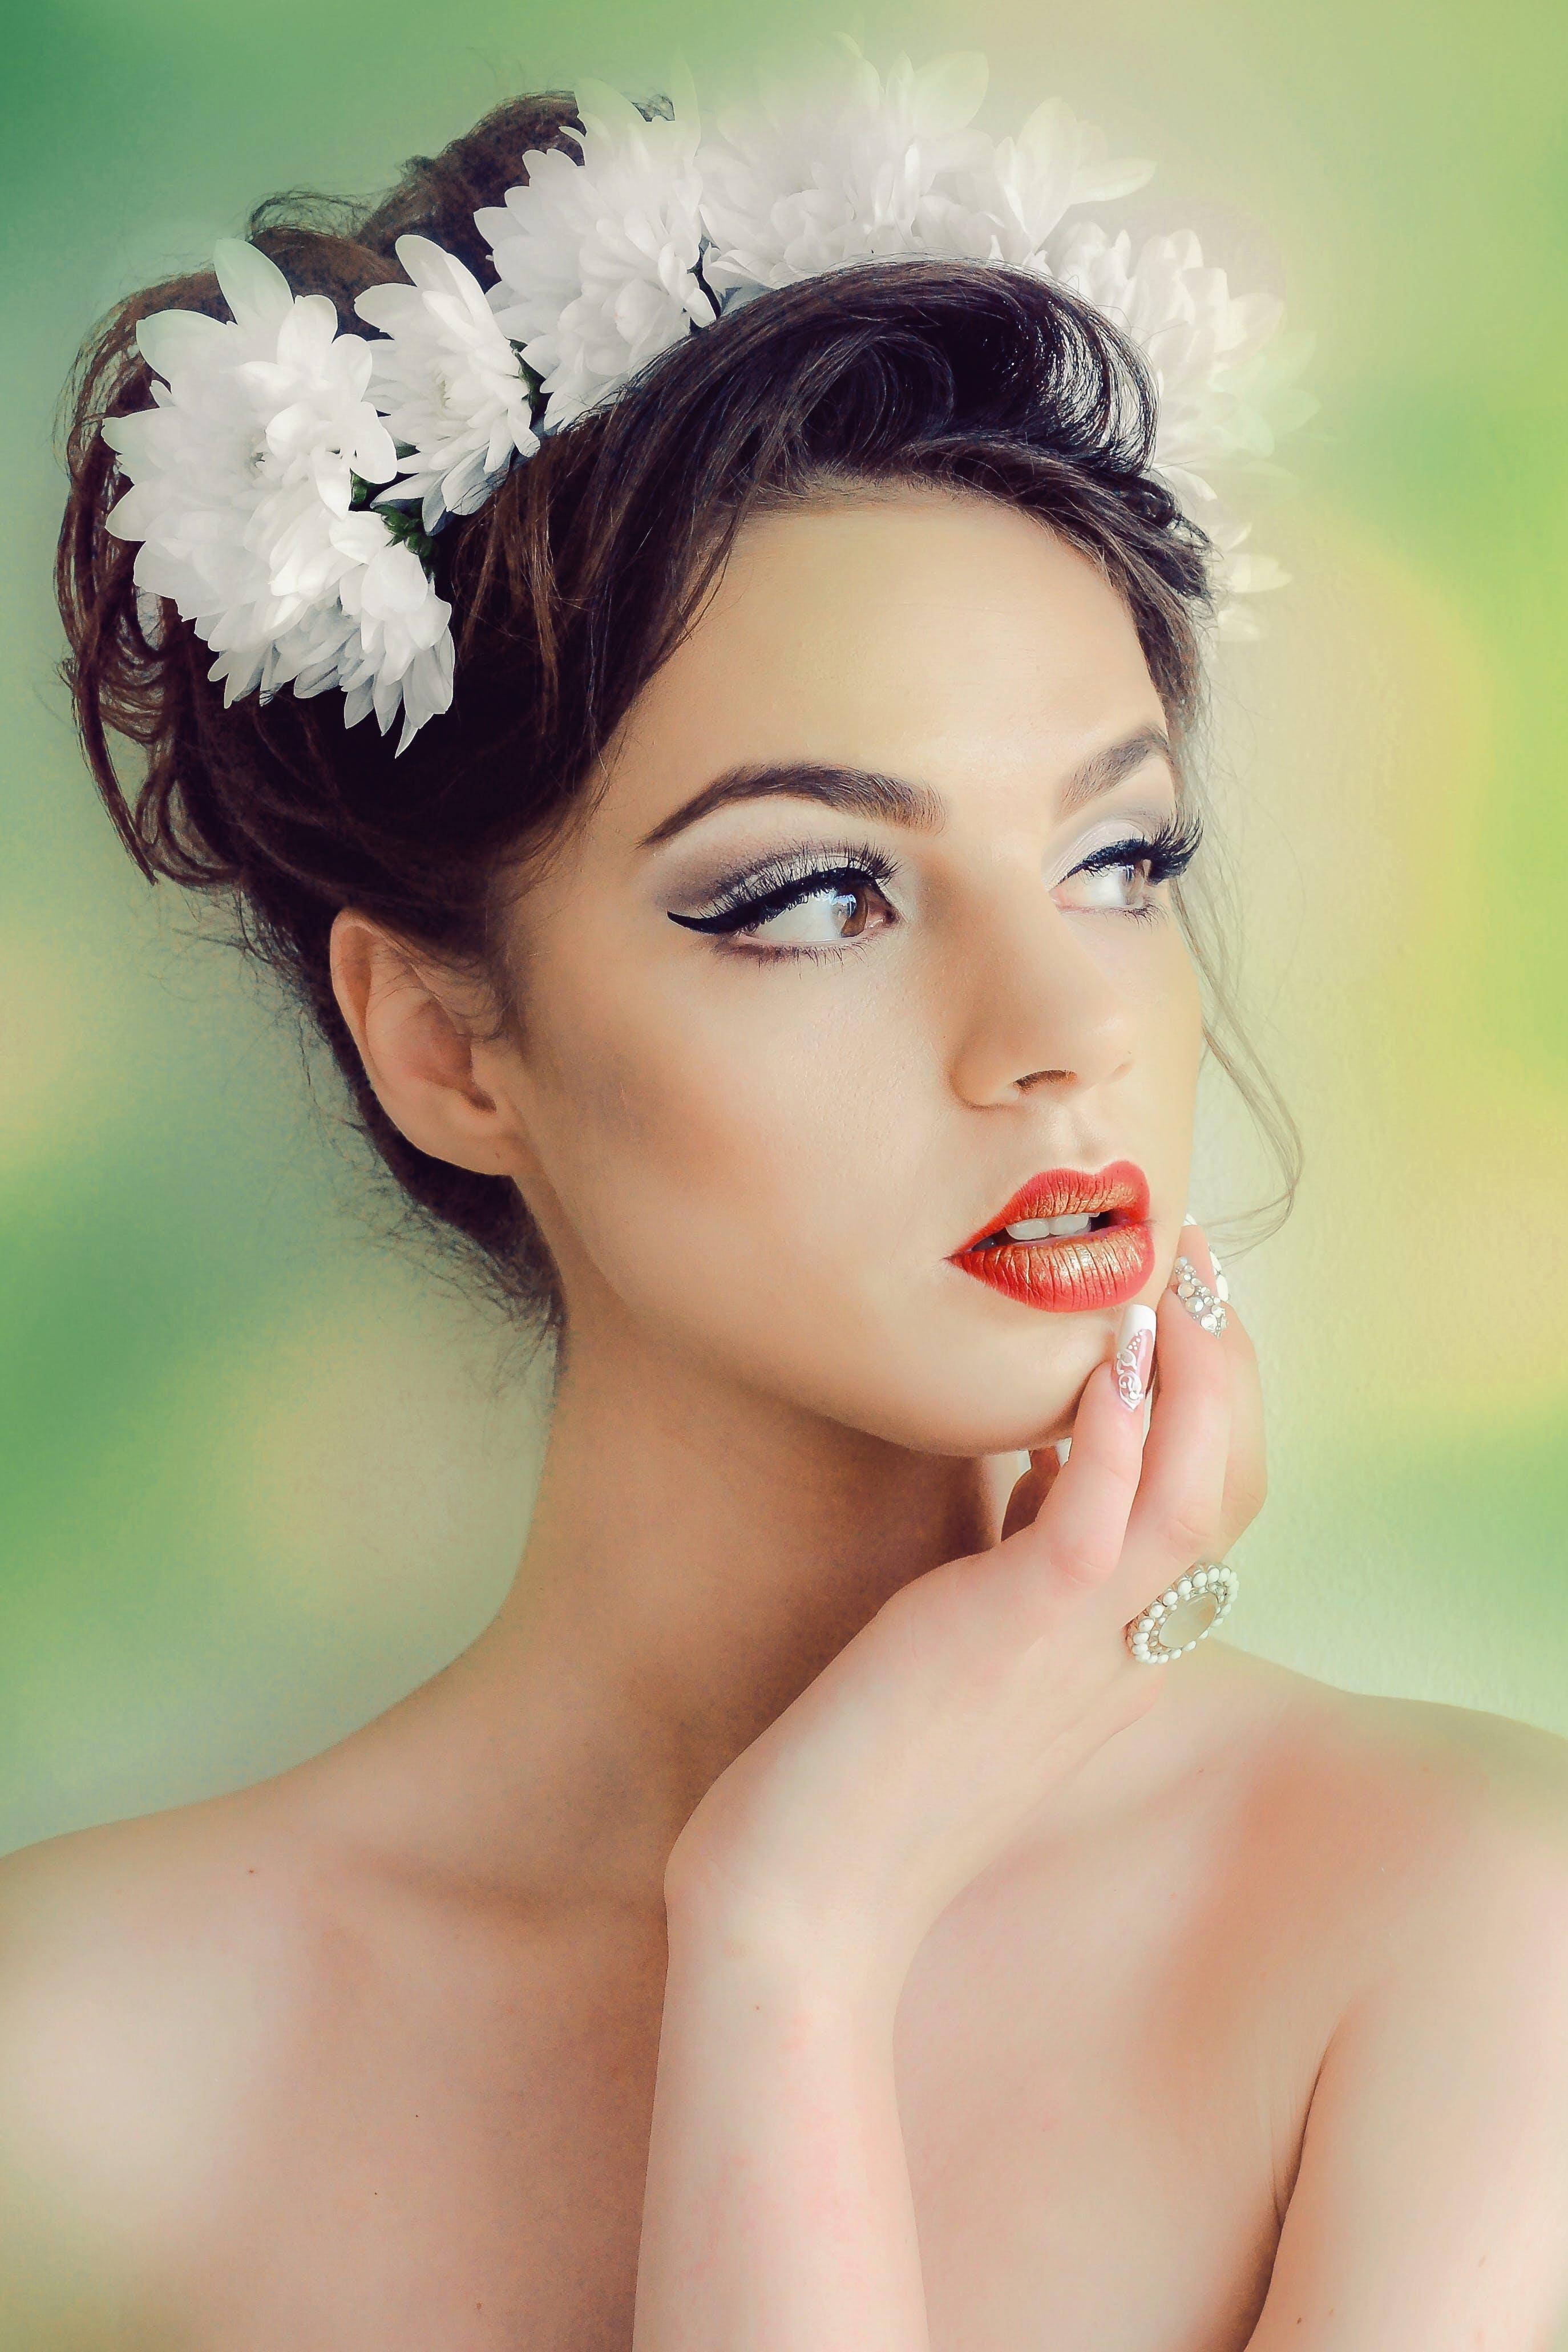 Free stock photo of fashion, flowers, girl, hot